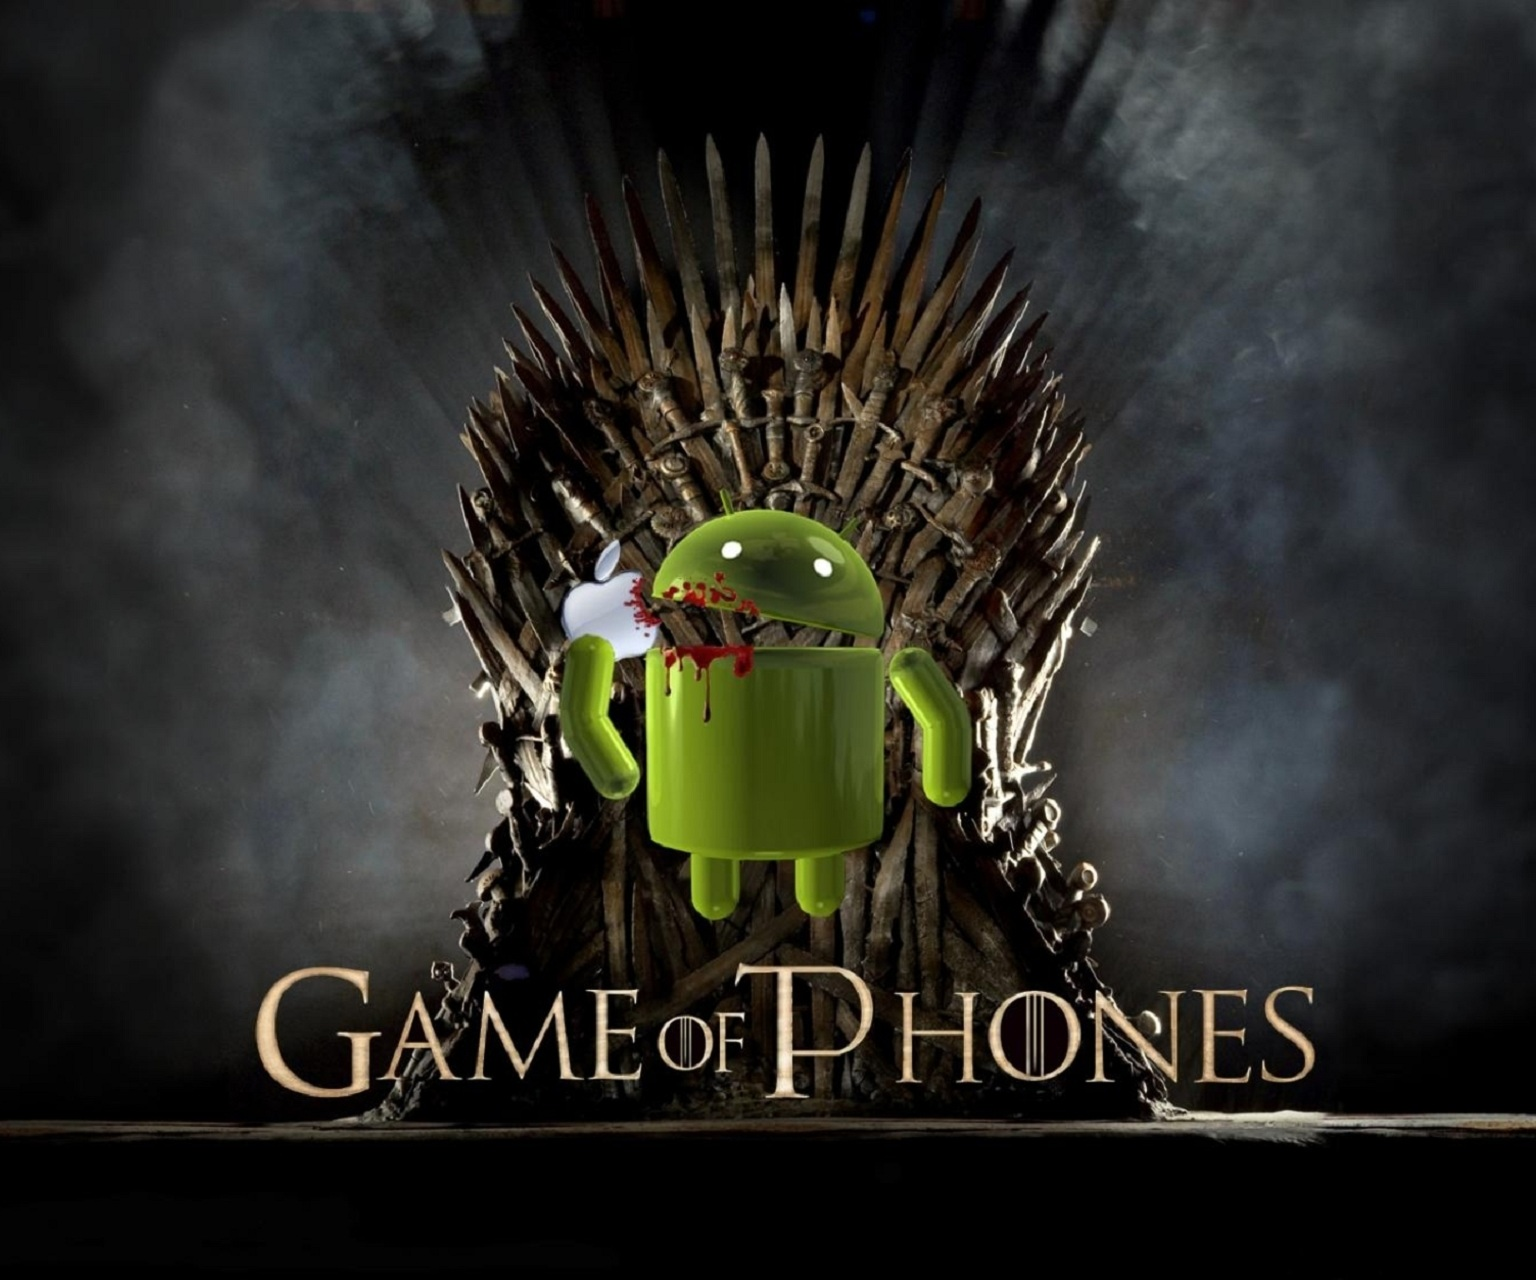 Game Of Thrones Phone Wallpaper Game Of Thrones Zoom Background 1536x1280 Download Hd Wallpaper Wallpapertip